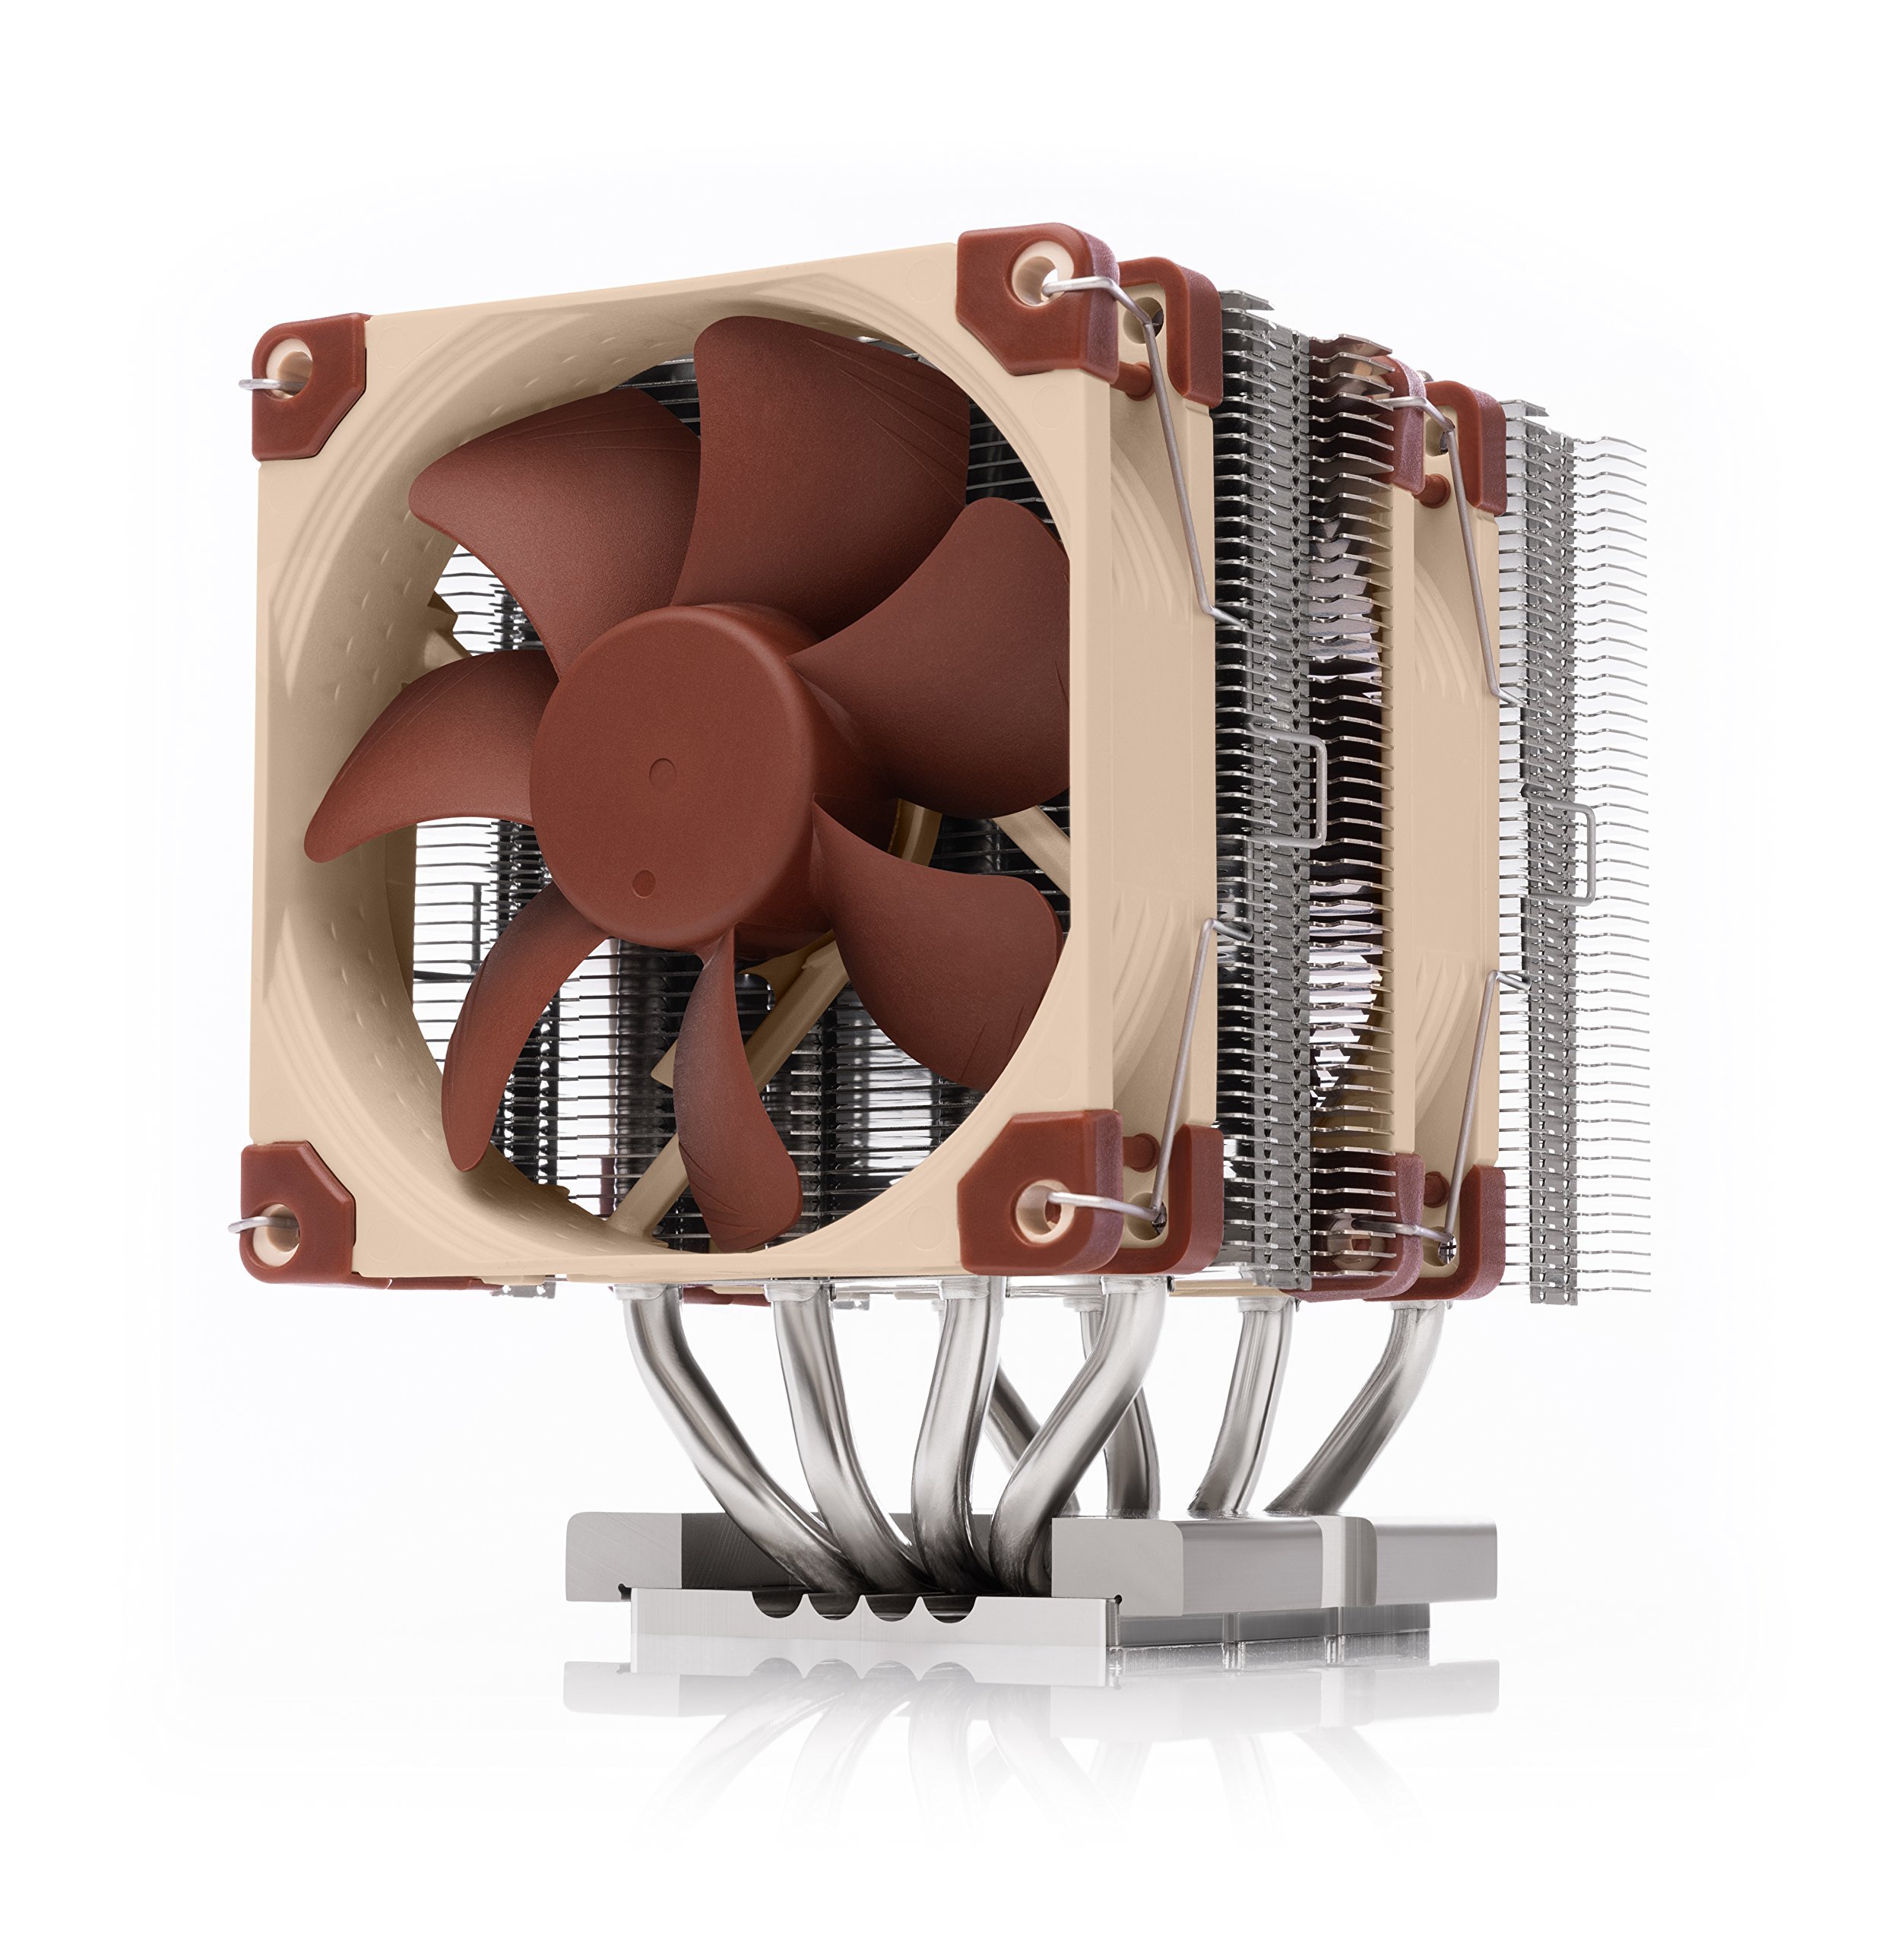 NOCTUA NH-D9 DX-3647 4U, Premium CPU Cooler for Intel Xeon LGA3647 (Brown) by NOCTUA